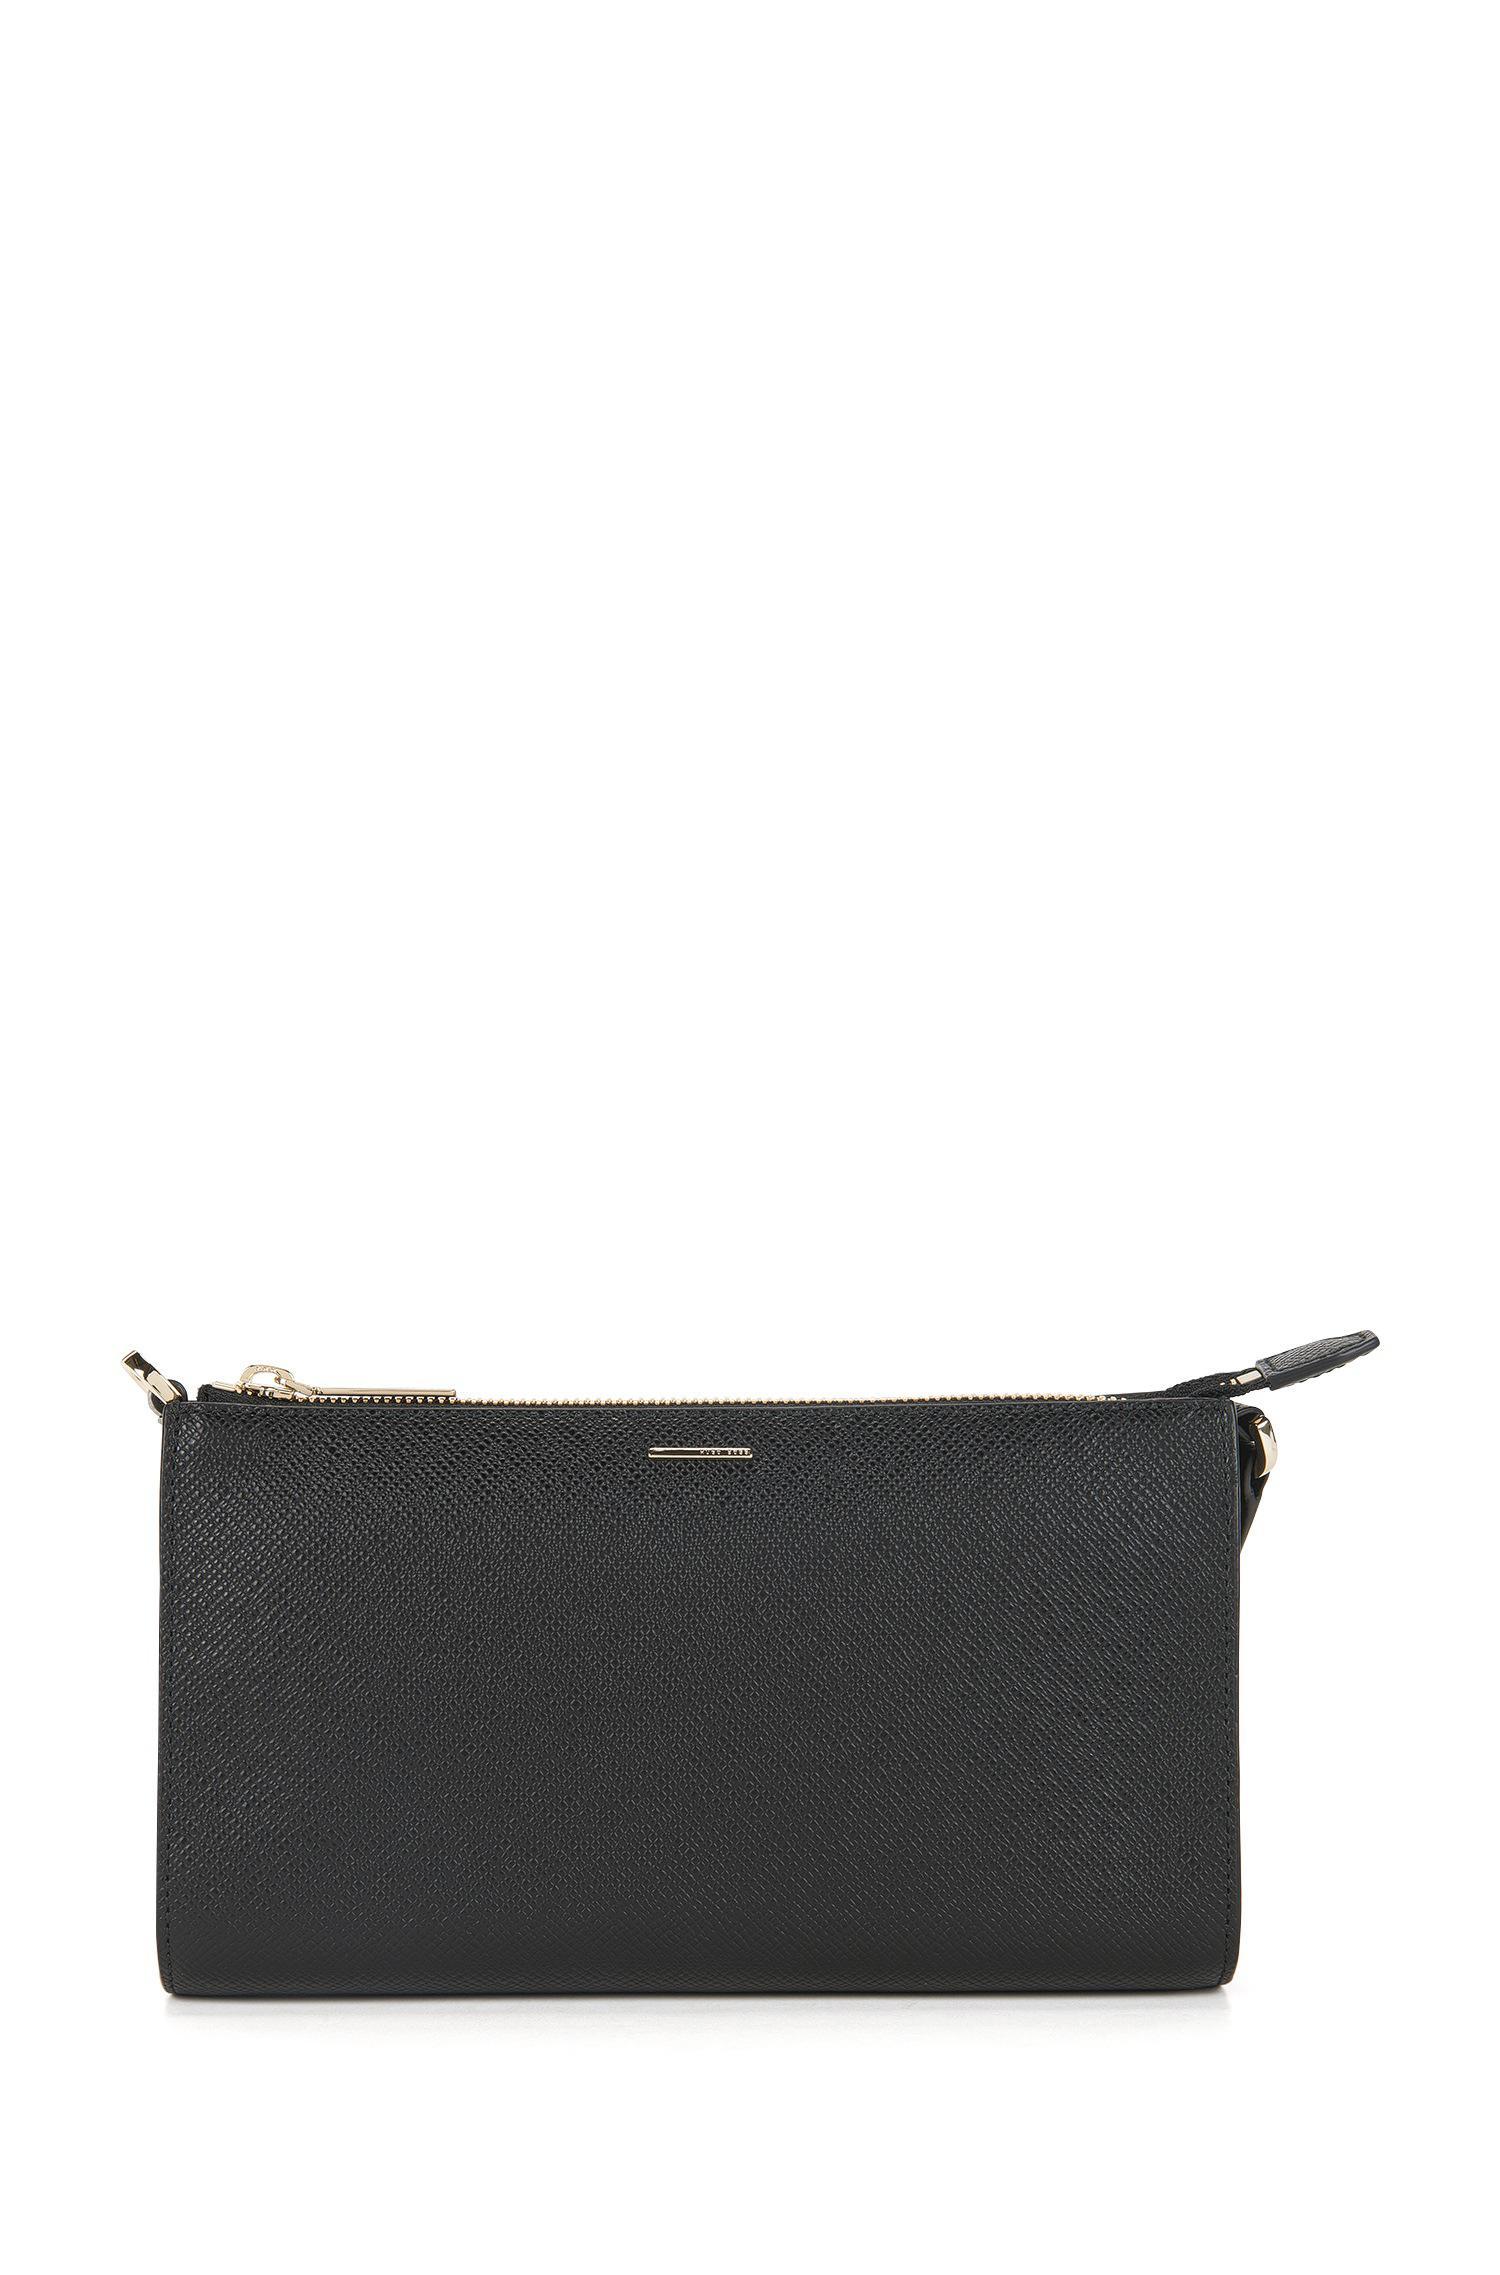 55d1a73be7c BOSS Calfskin Emed Clutch | Staple Mini Bag Fpb in Black - Lyst